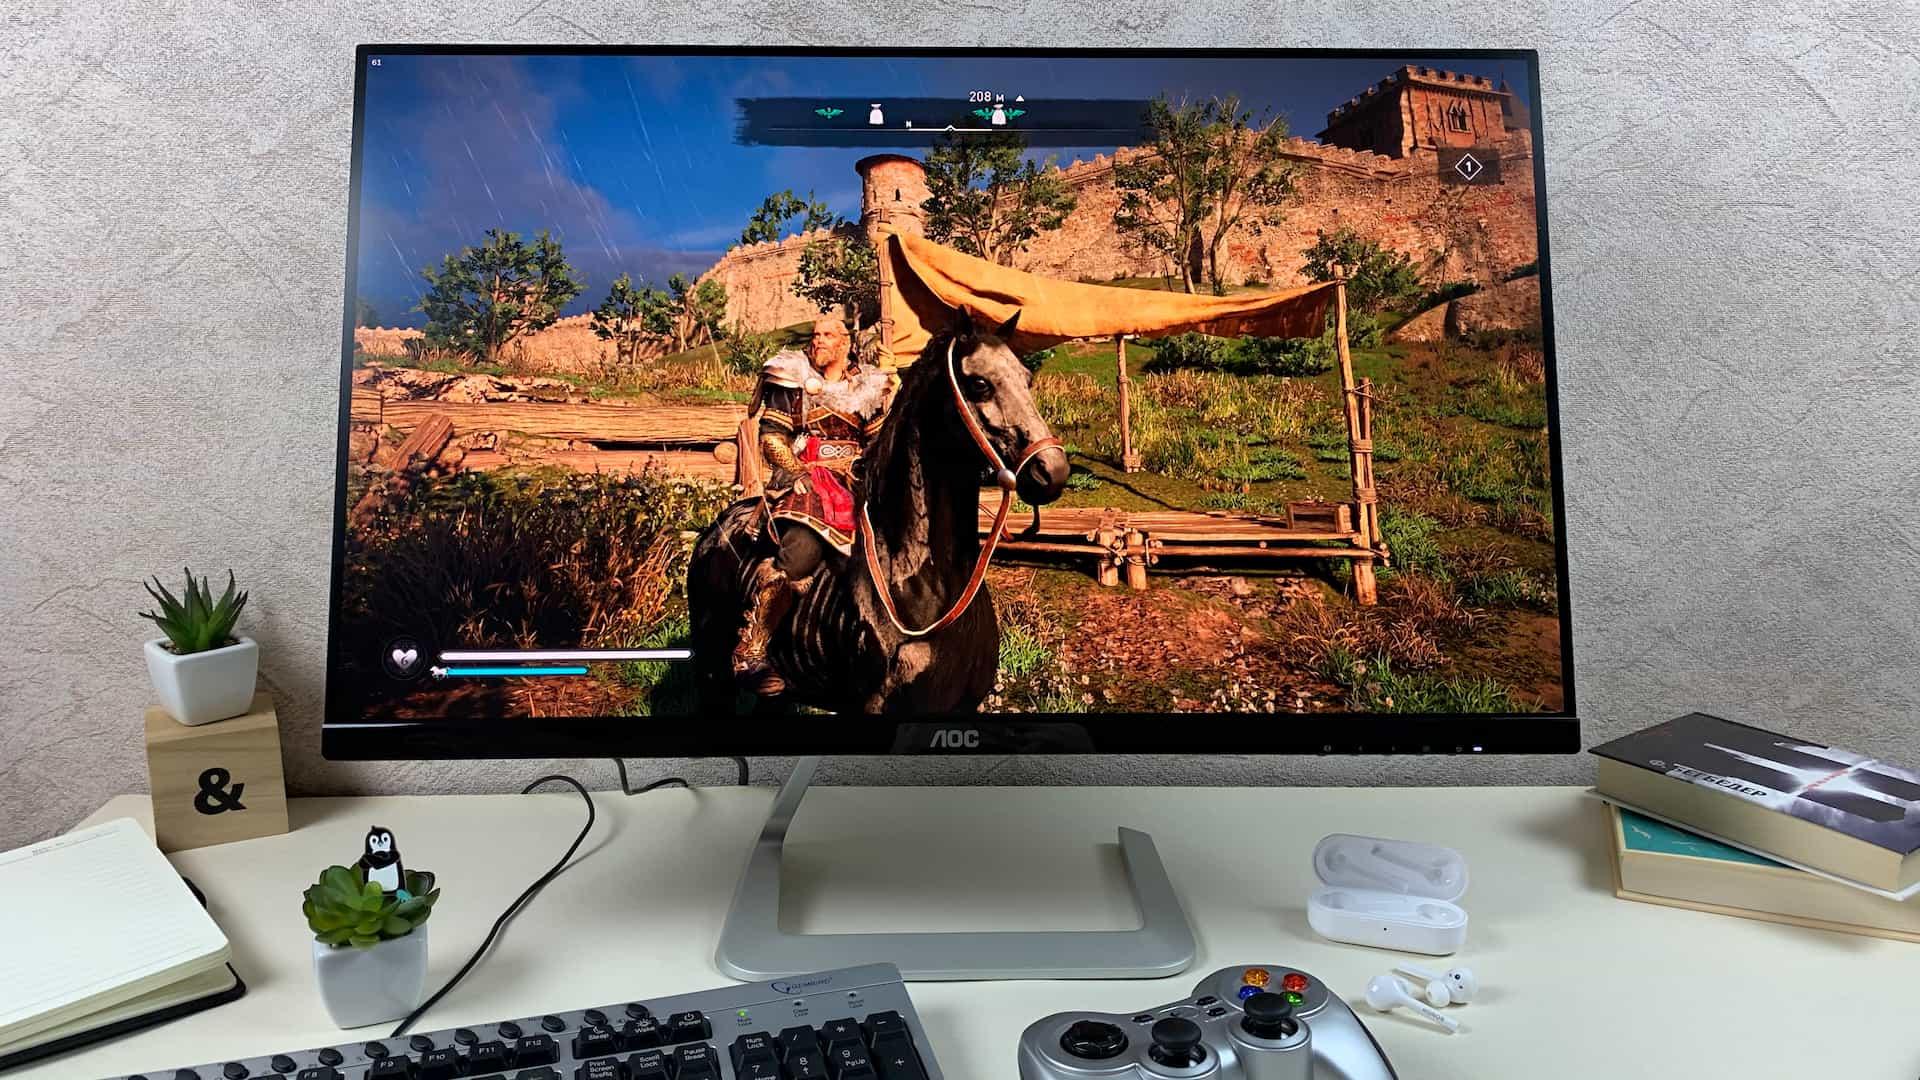 AOC Q27T1 (Assassin's Creed Valhalla)